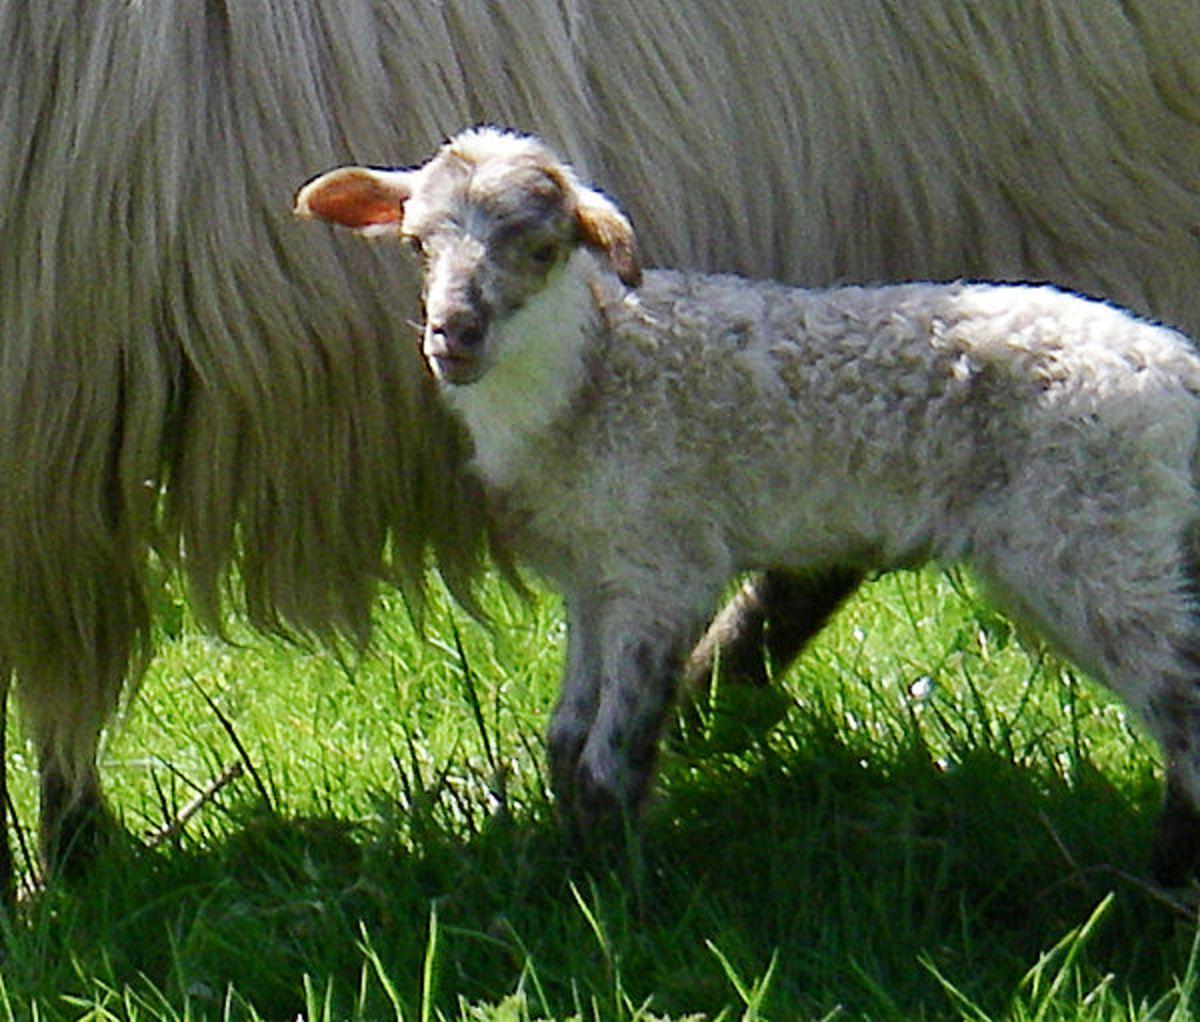 Lamb Psyche, 4 days old